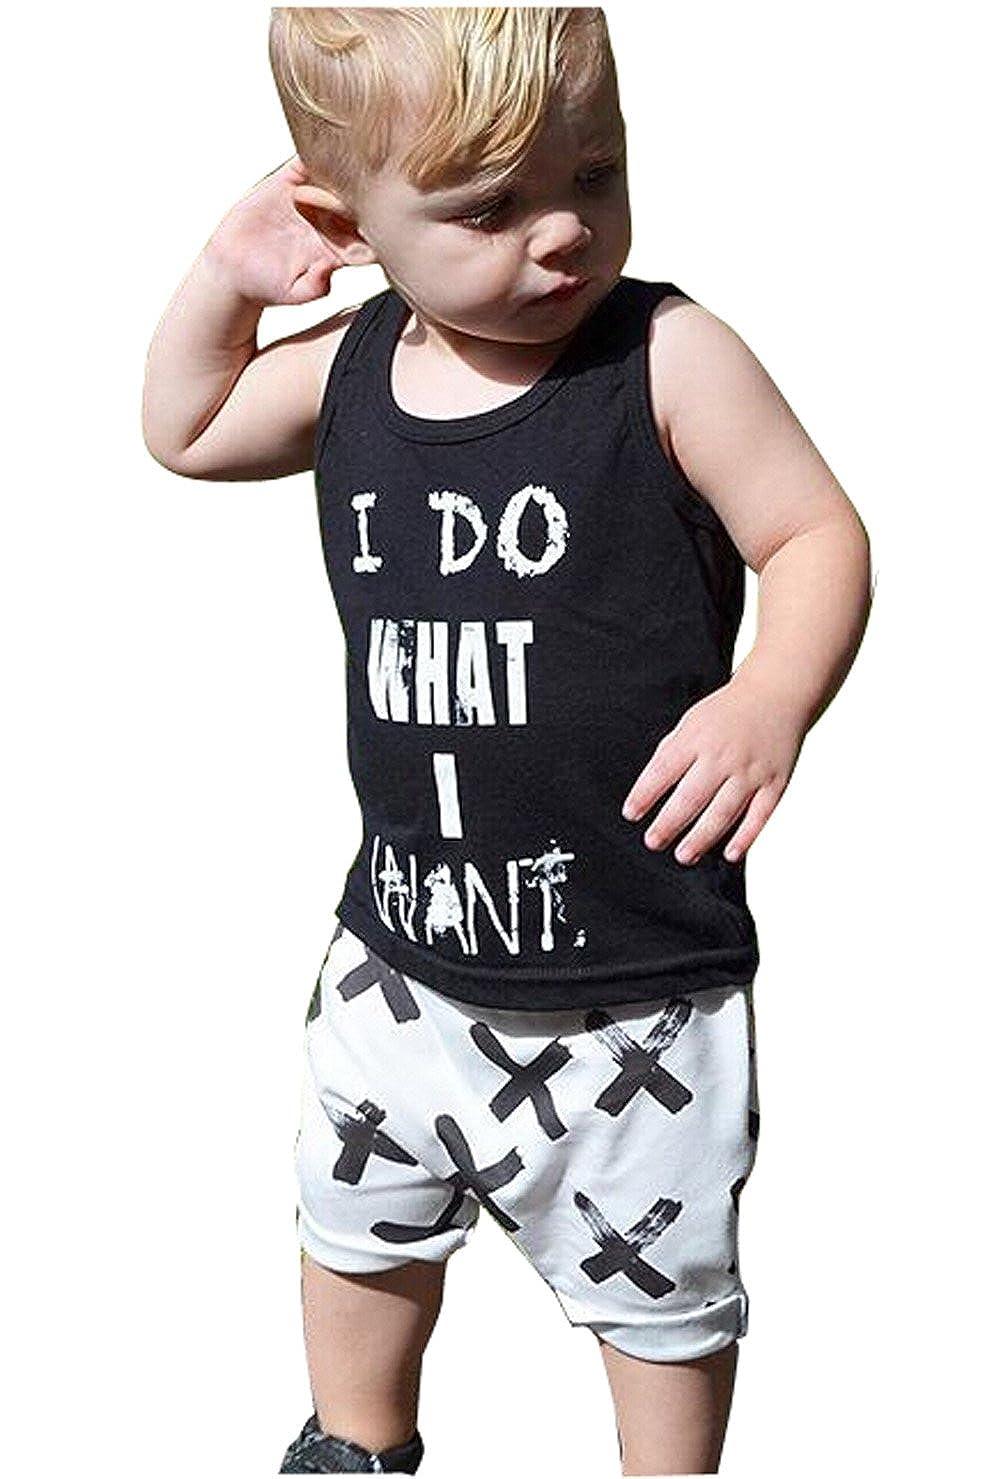 2pcs Newborn Baby Boys Black T-shirt Tops+White Cross Print Pants Outfits Set